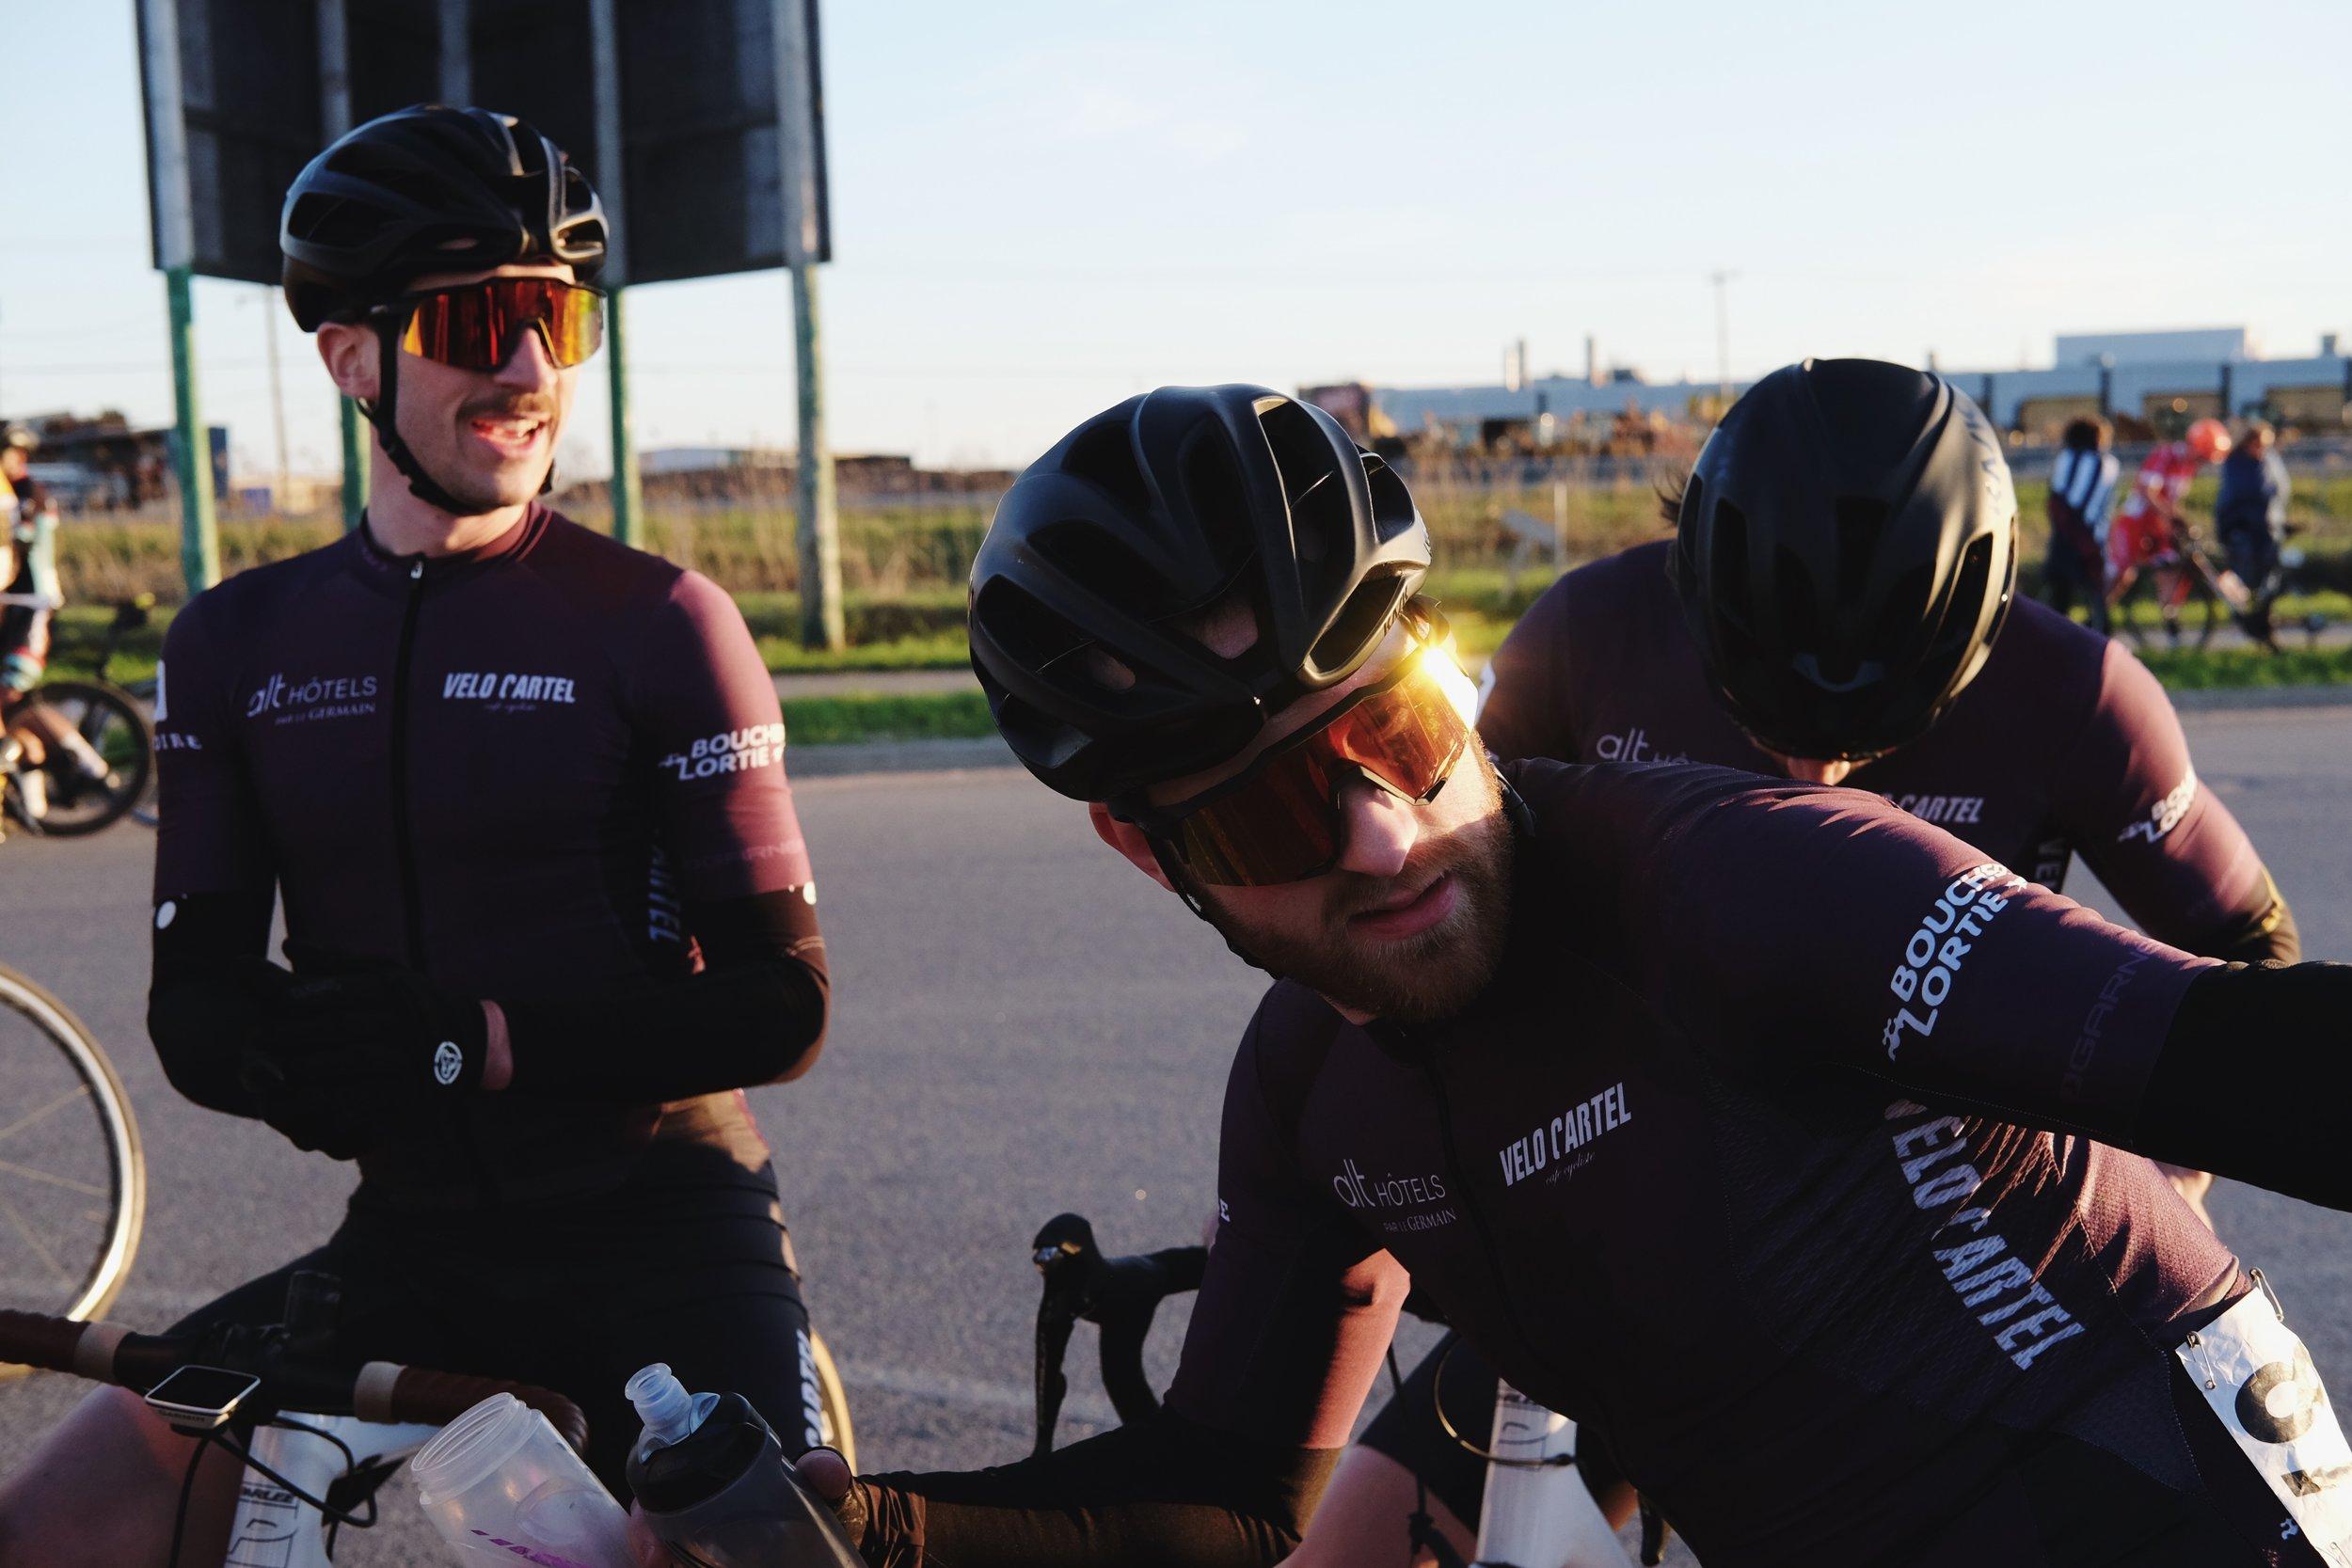 Équipe cycliste élite Vélo Cartel X Bello - Division élite